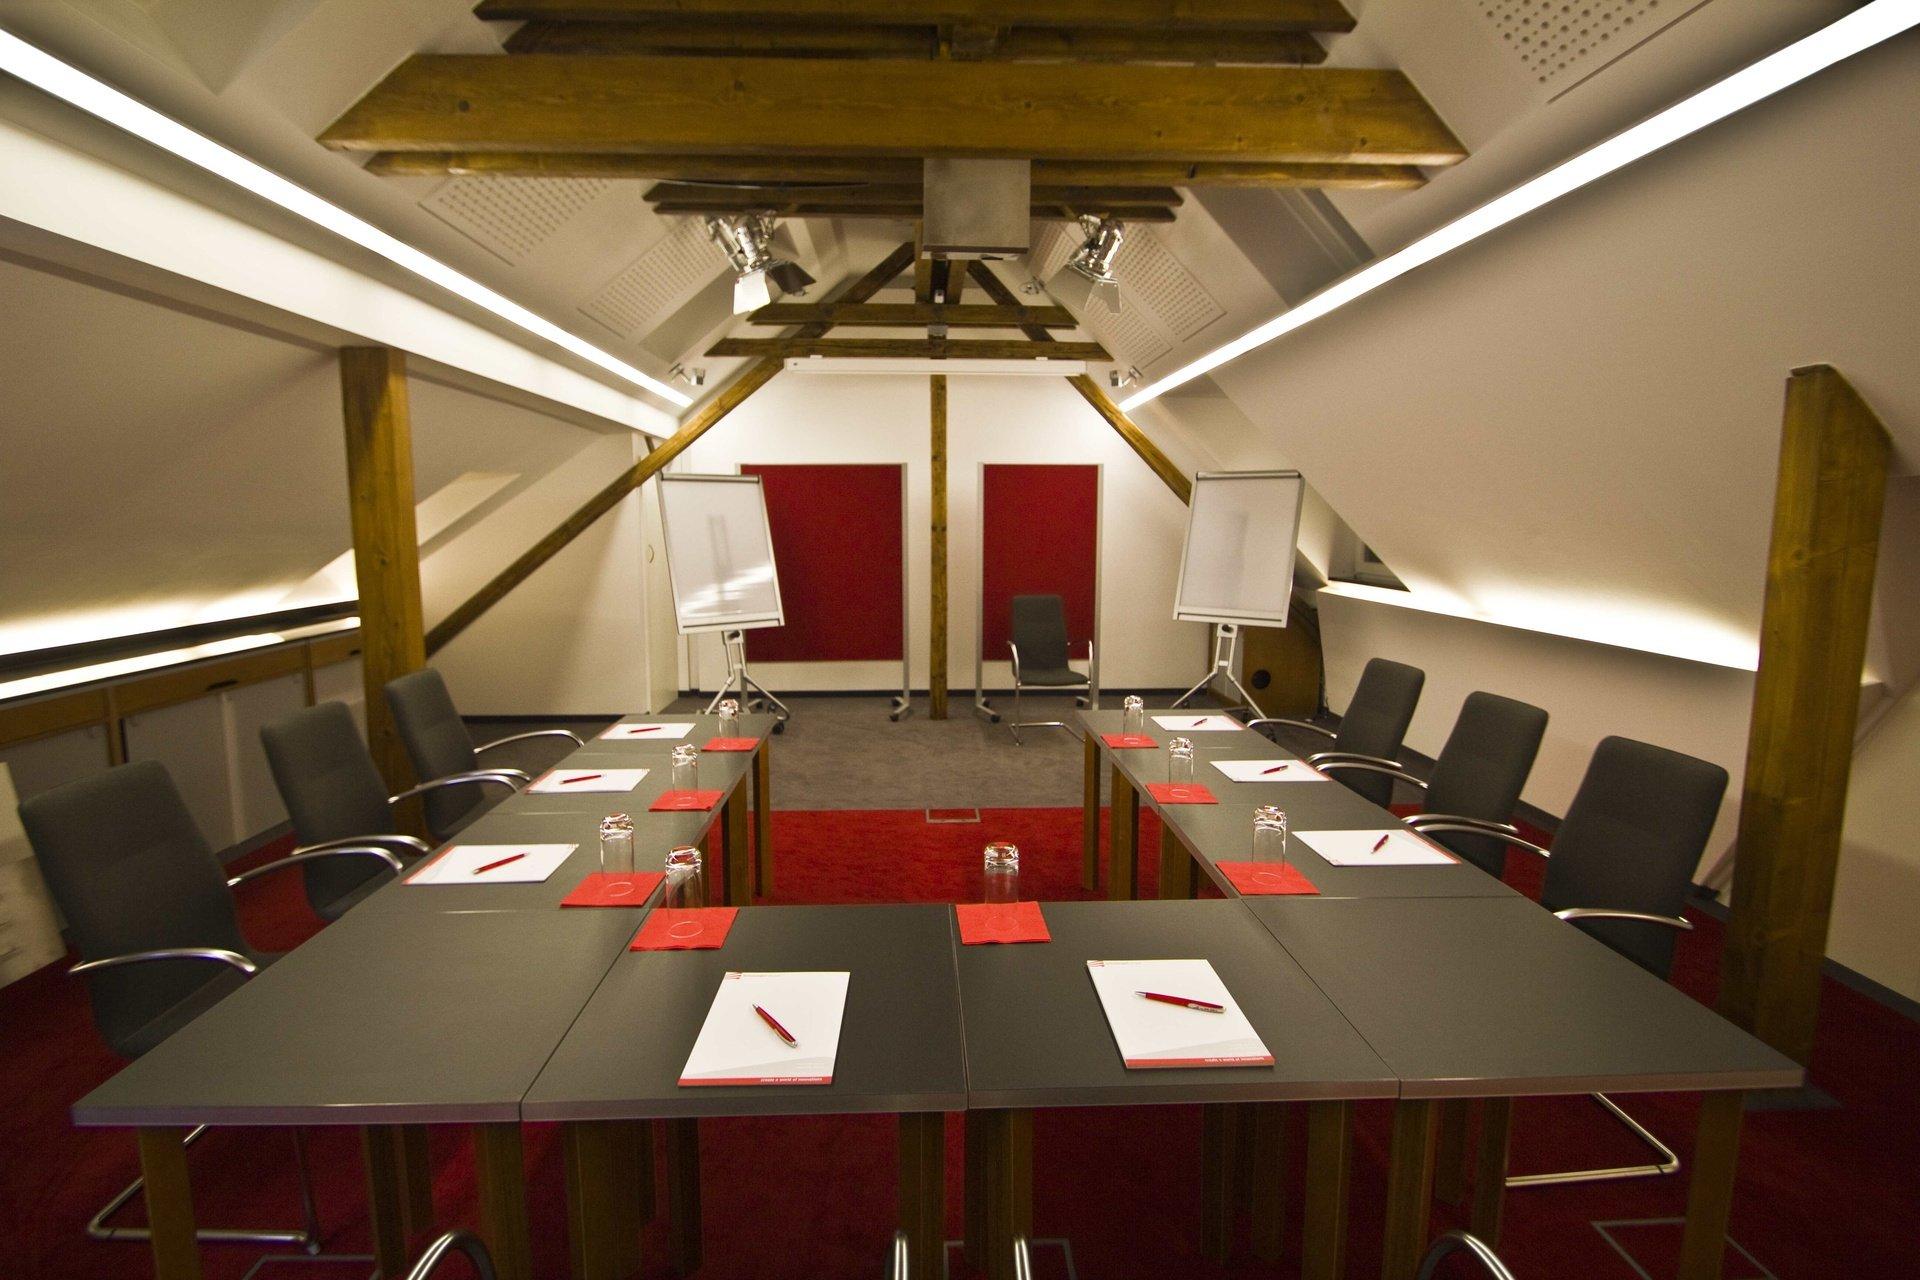 Leipzig training rooms Salle de réunion Seminarcentre Leipzig - Room Denkmeer image 0